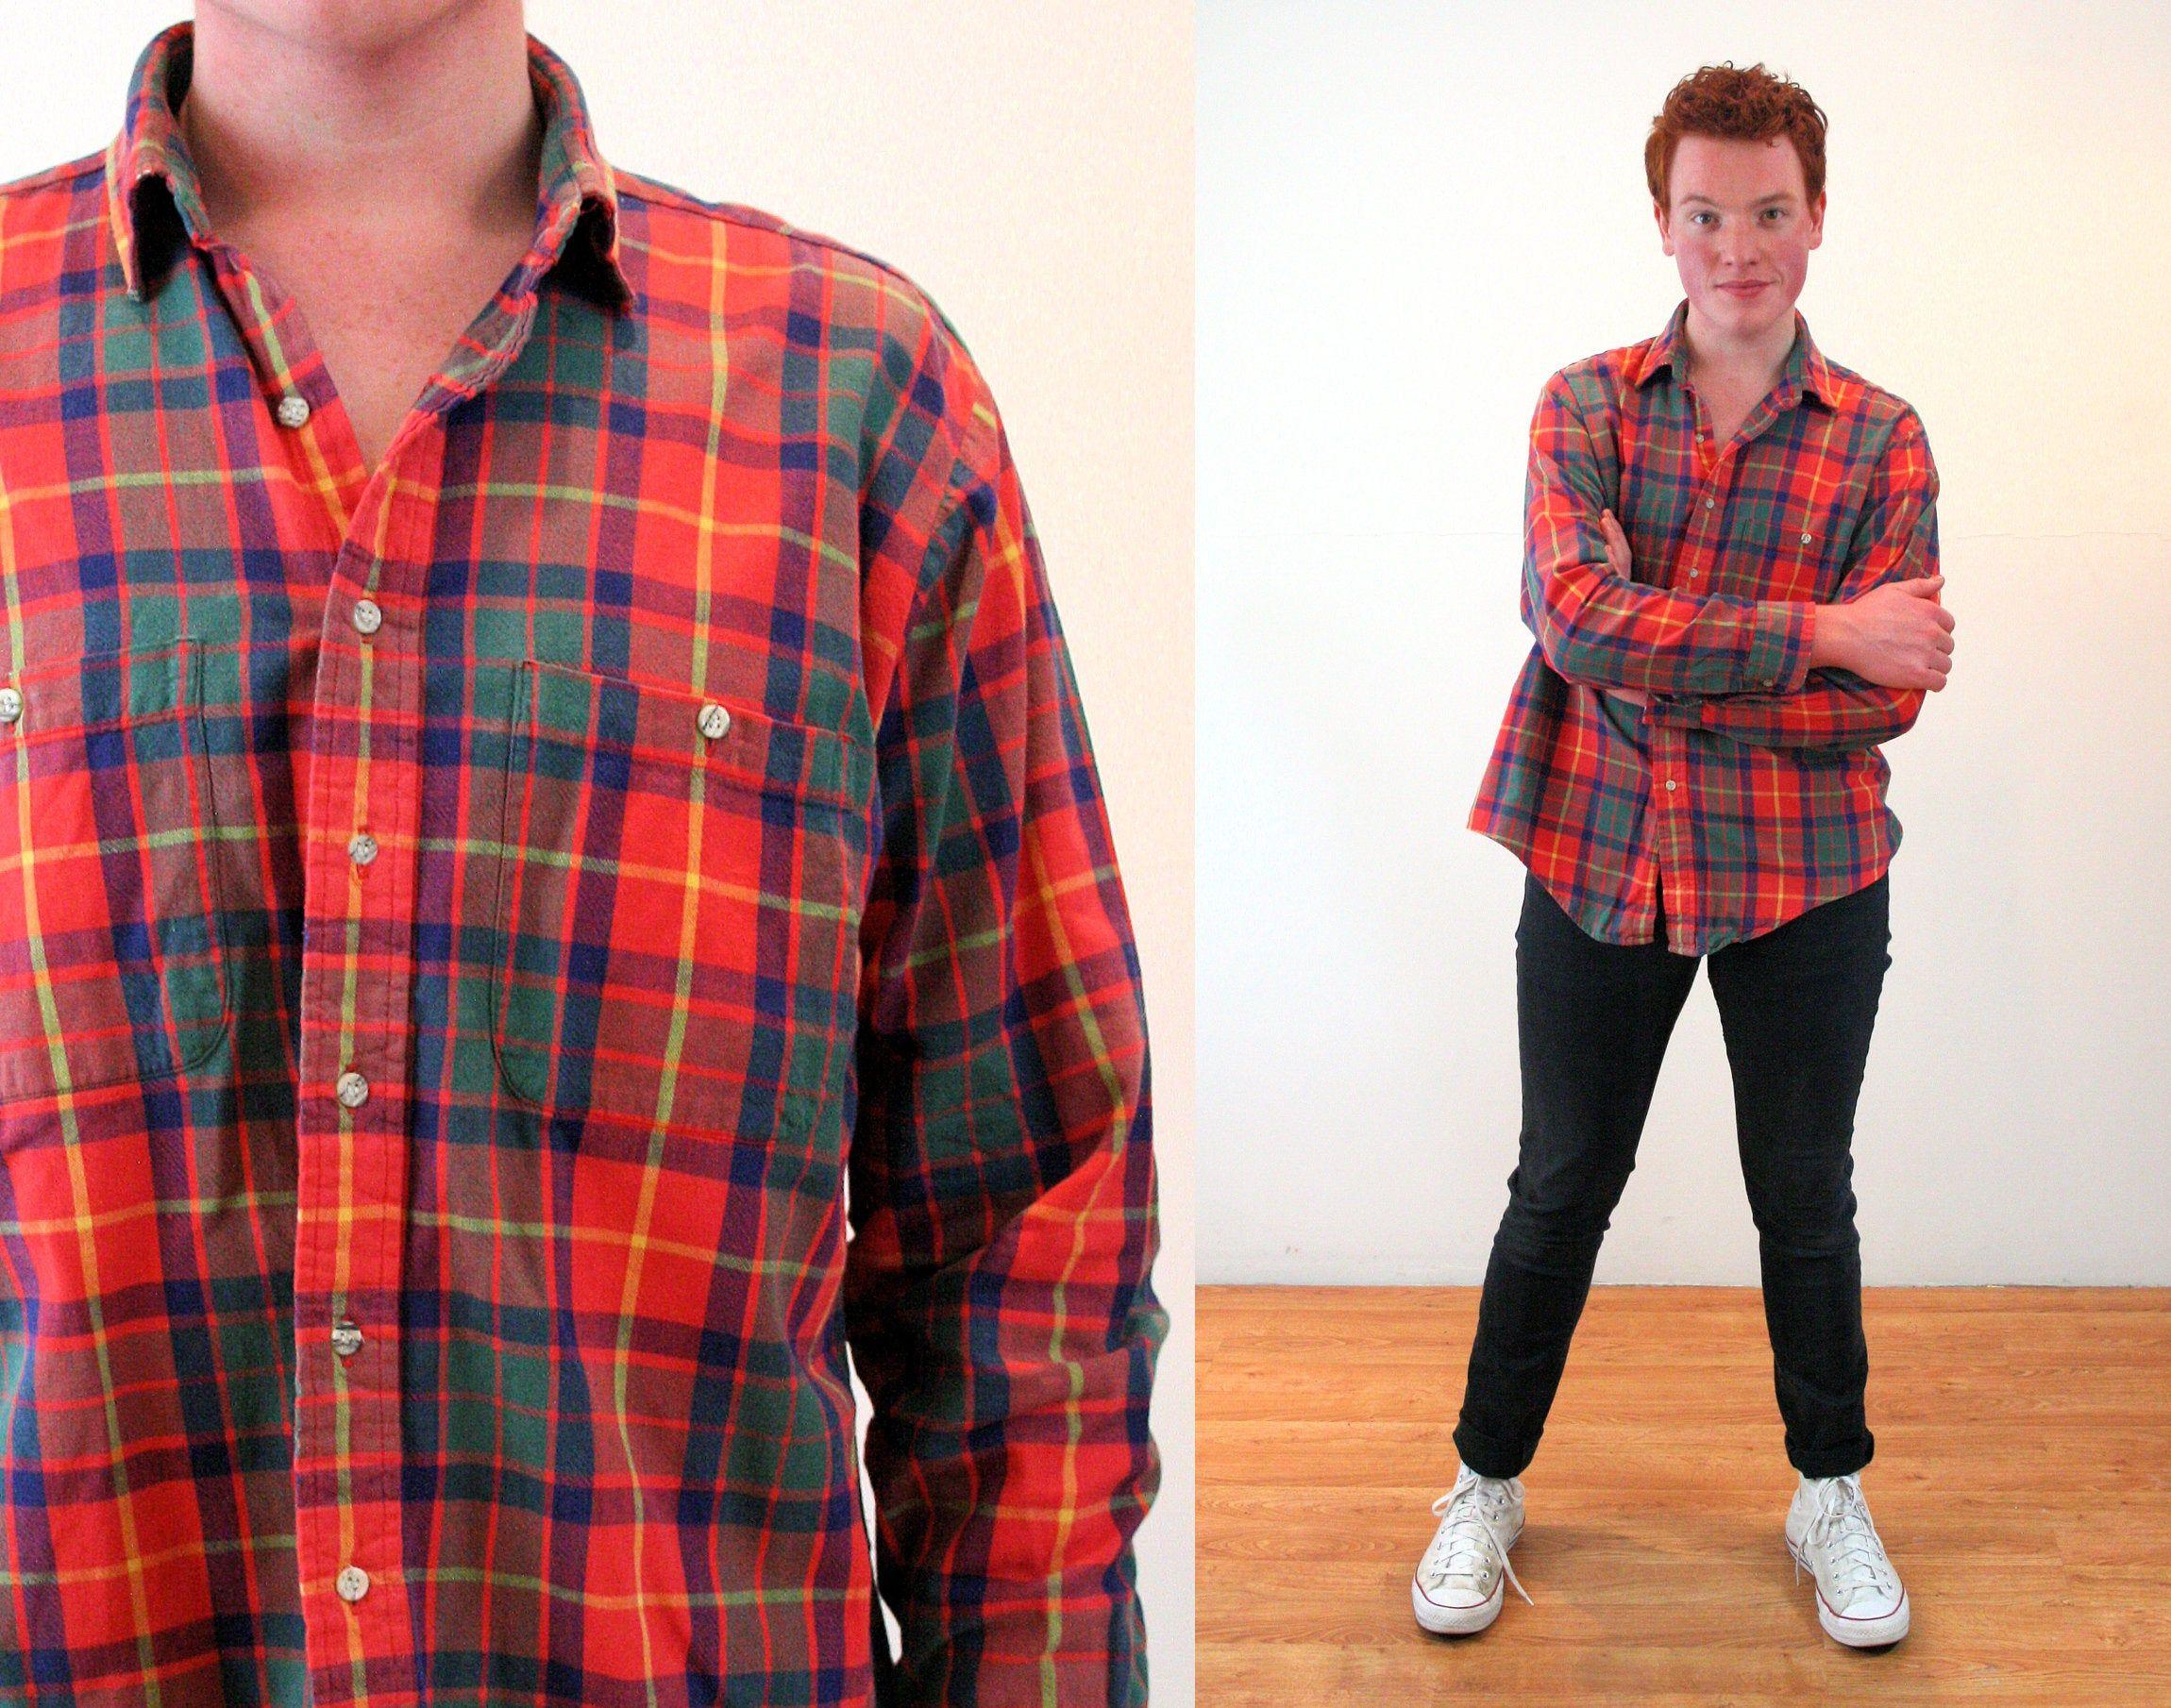 Maroon Hunter Green Dark Plaid Button Down Long Sleeve Shirt Lightweight Cotton Summer Plaid 80s Vintage Plaid Shirt